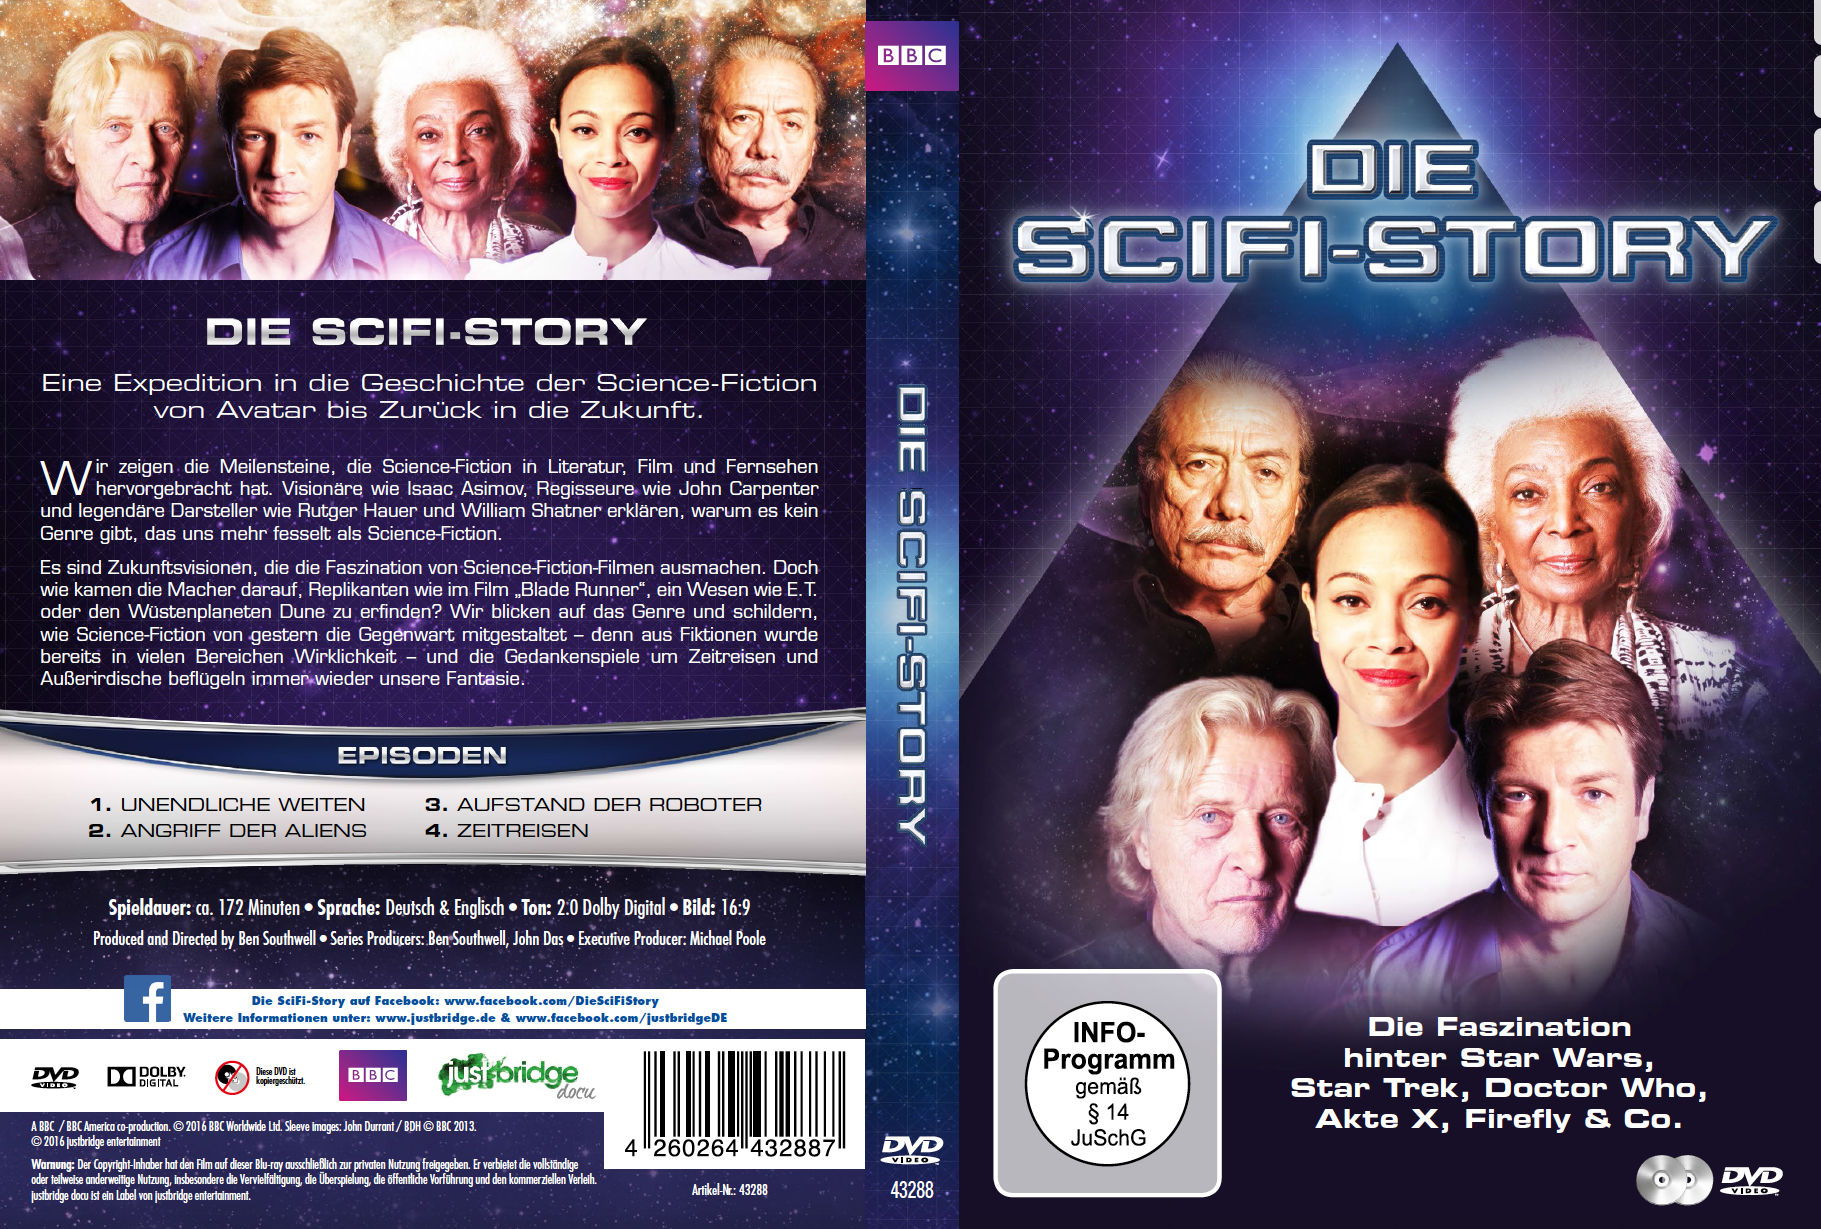 Banners_and_Alerts_und_43288_Sleeve_Die_SciFi-Story_DVD_Ansicht_pdf